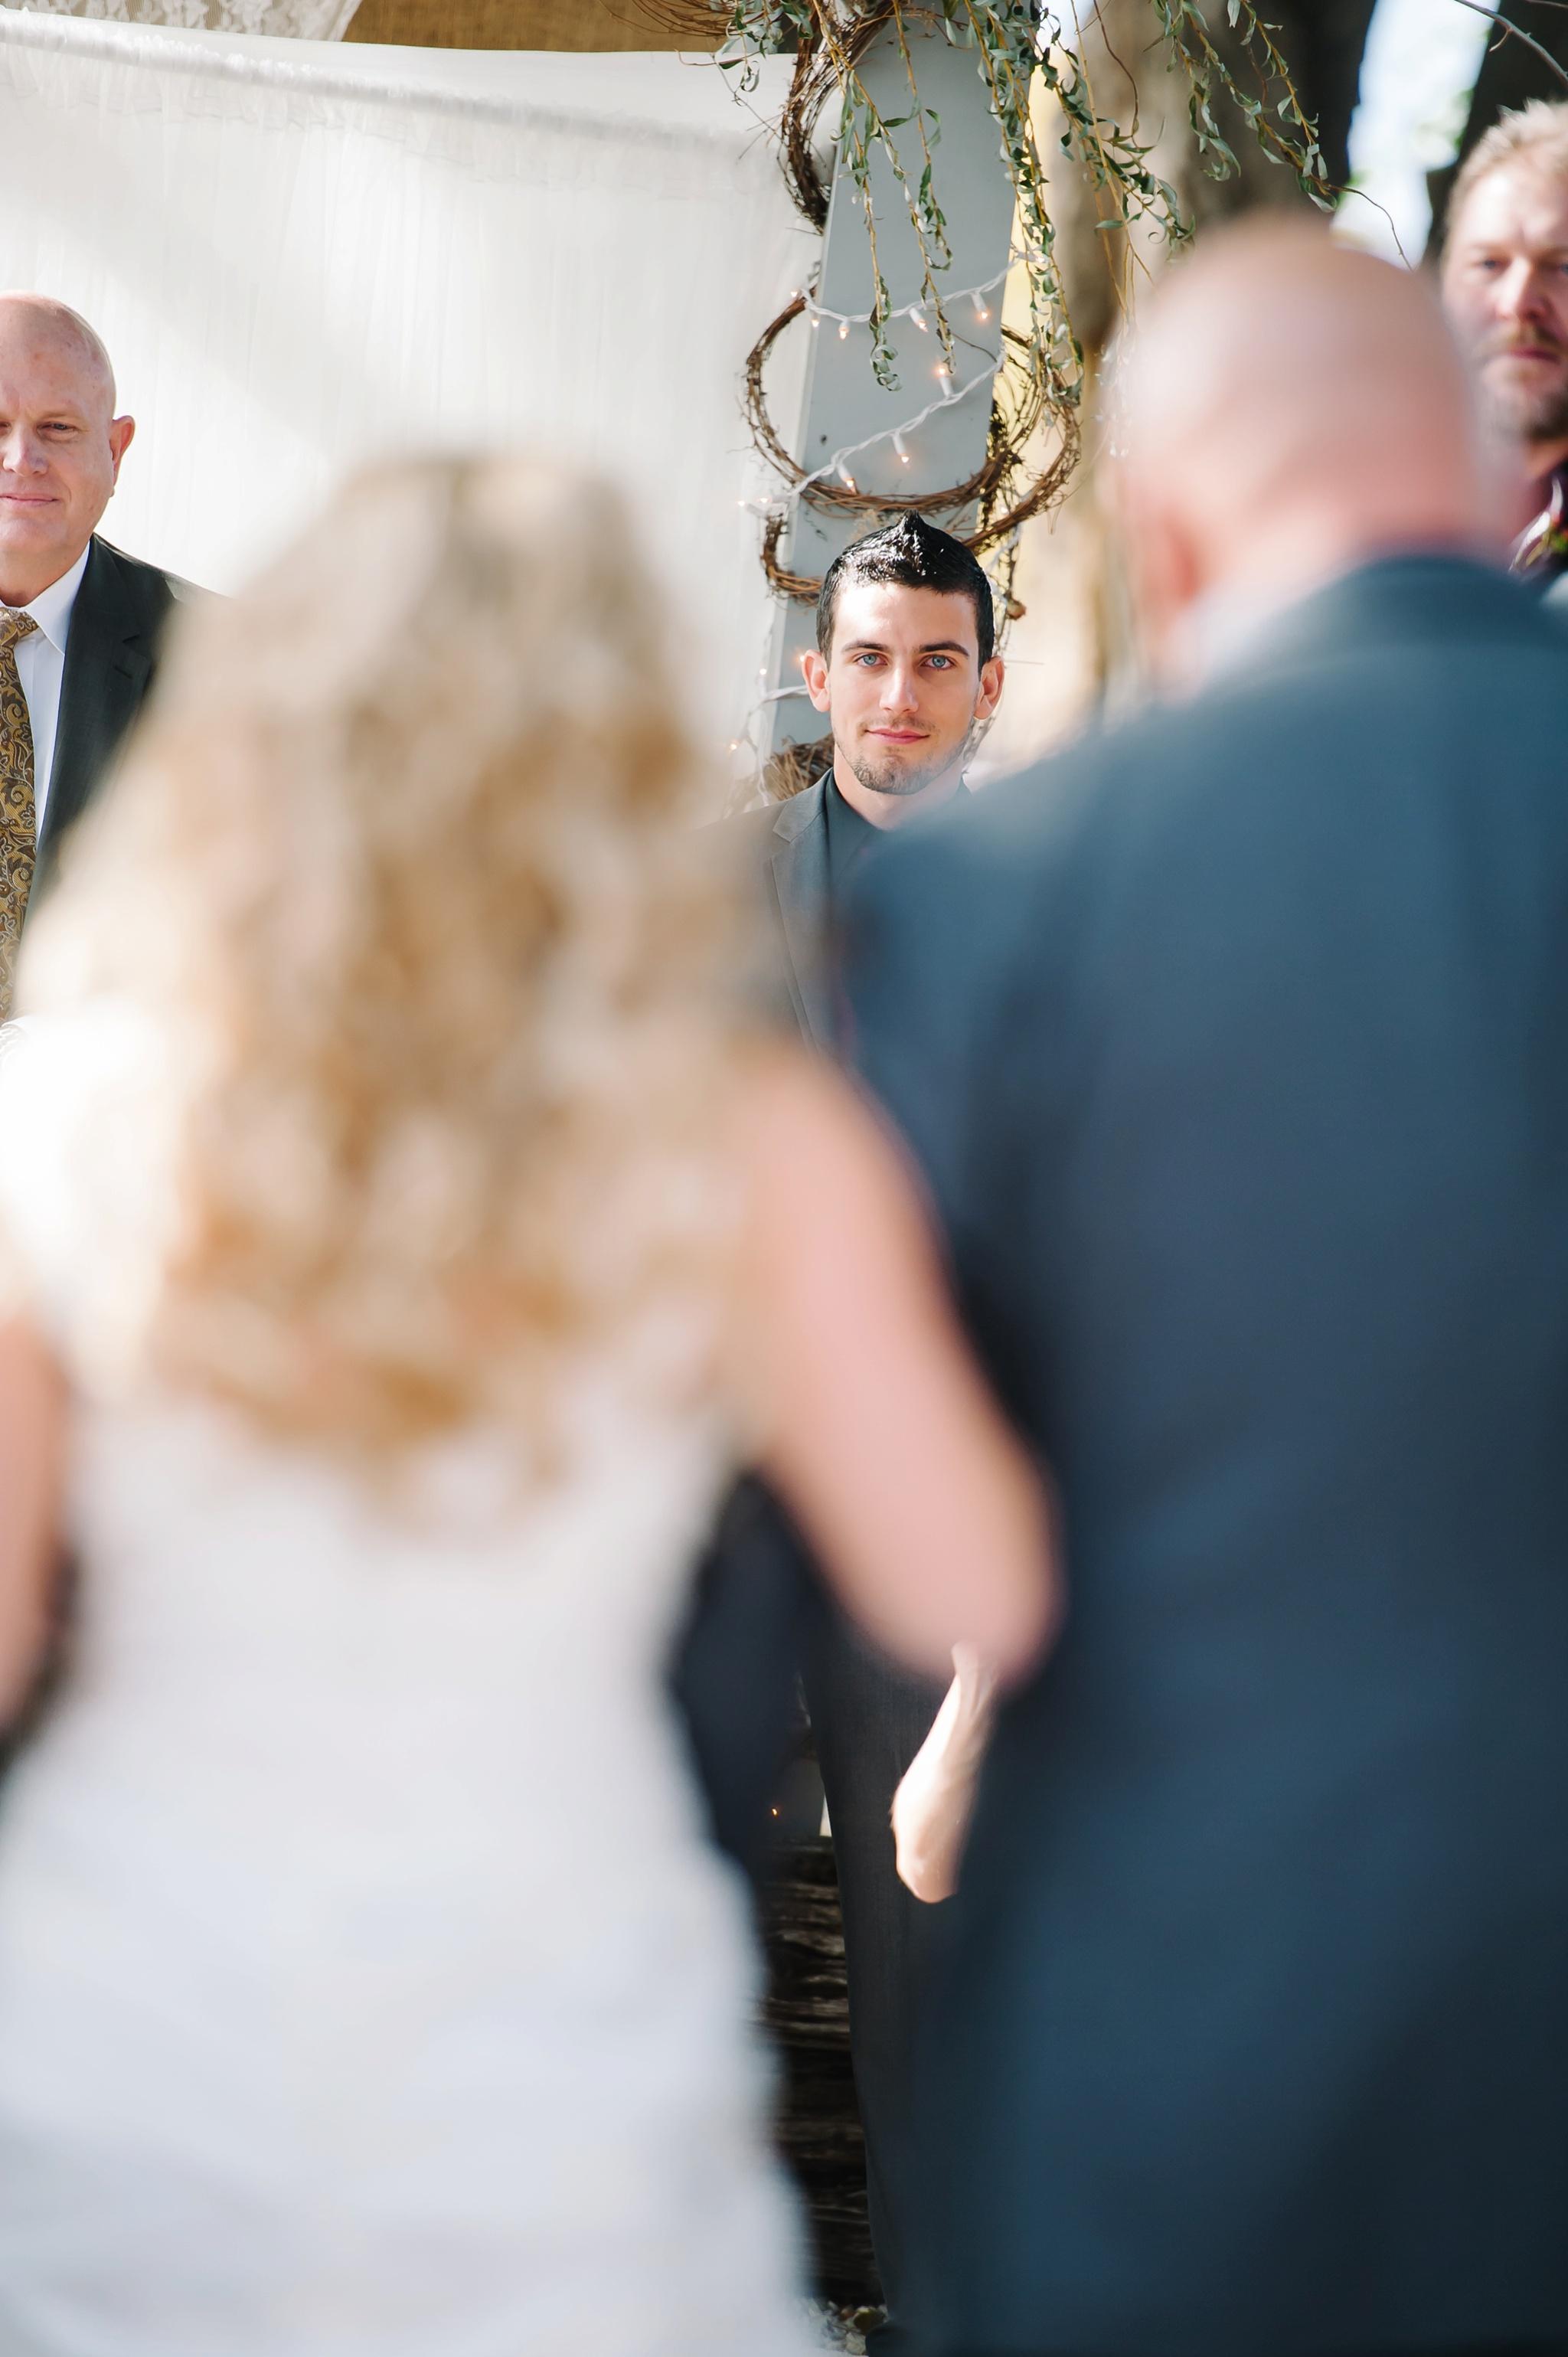 SLC Utah Wedding Photographer Ali Sumsion 025